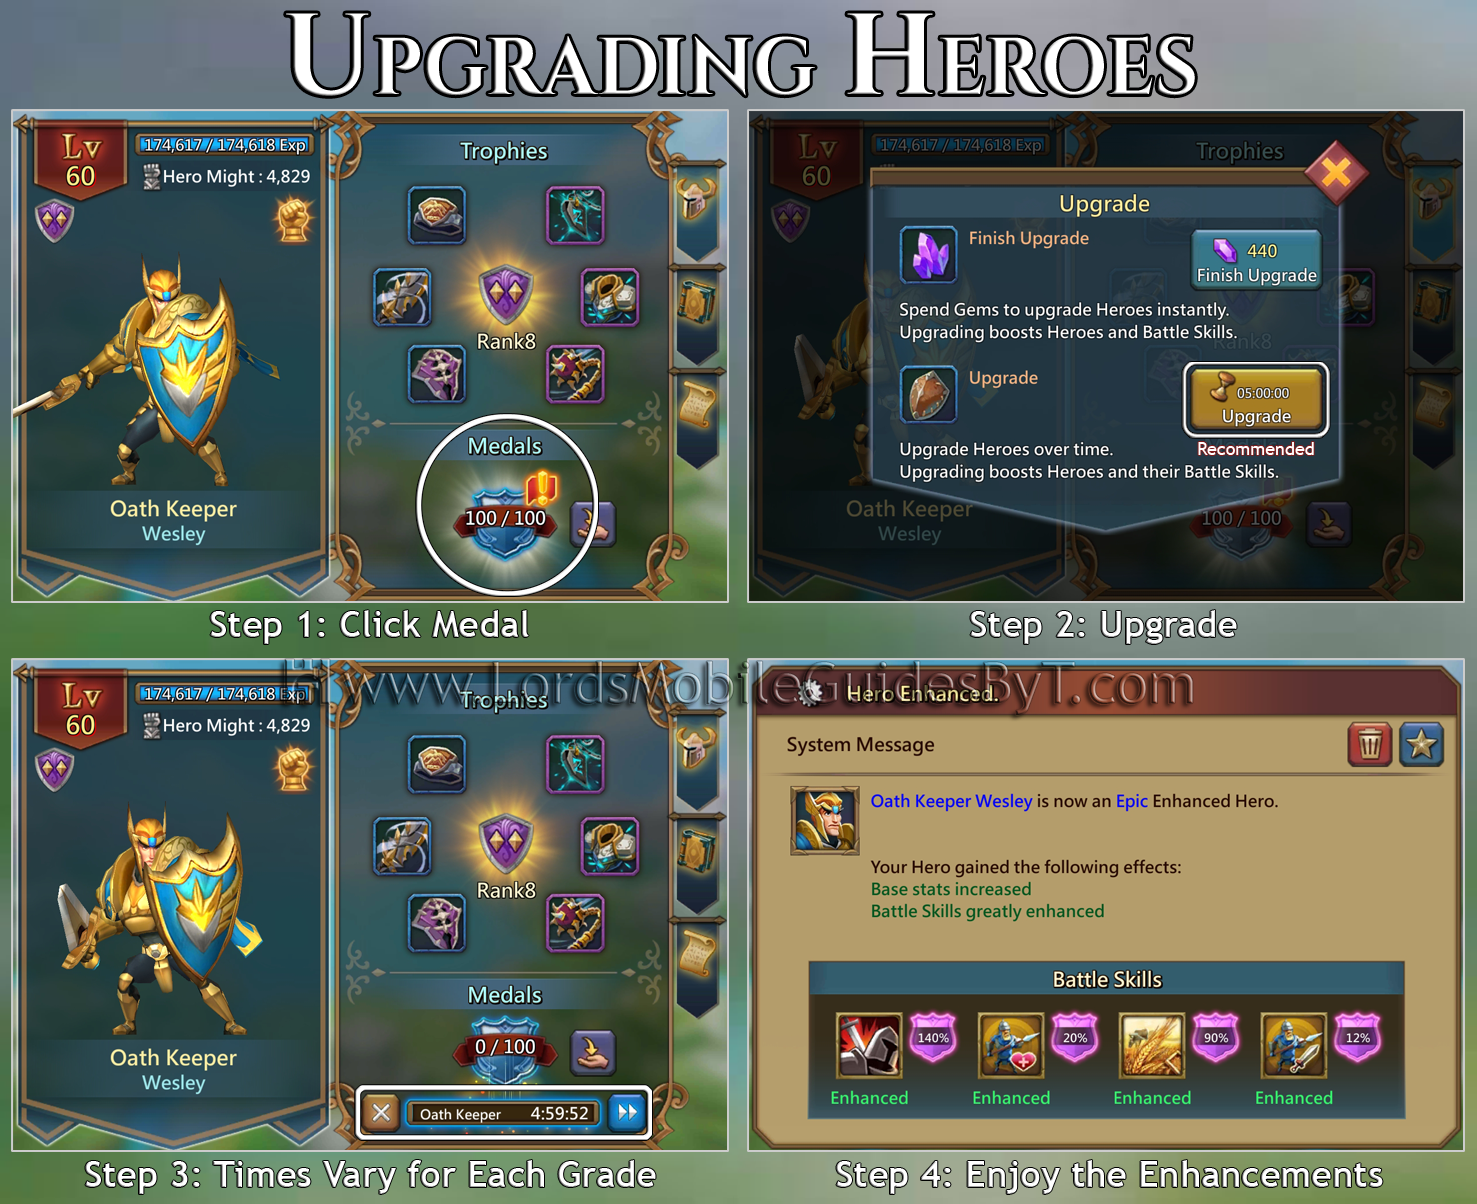 Heros: Types, Grades, Levels, & Ranks